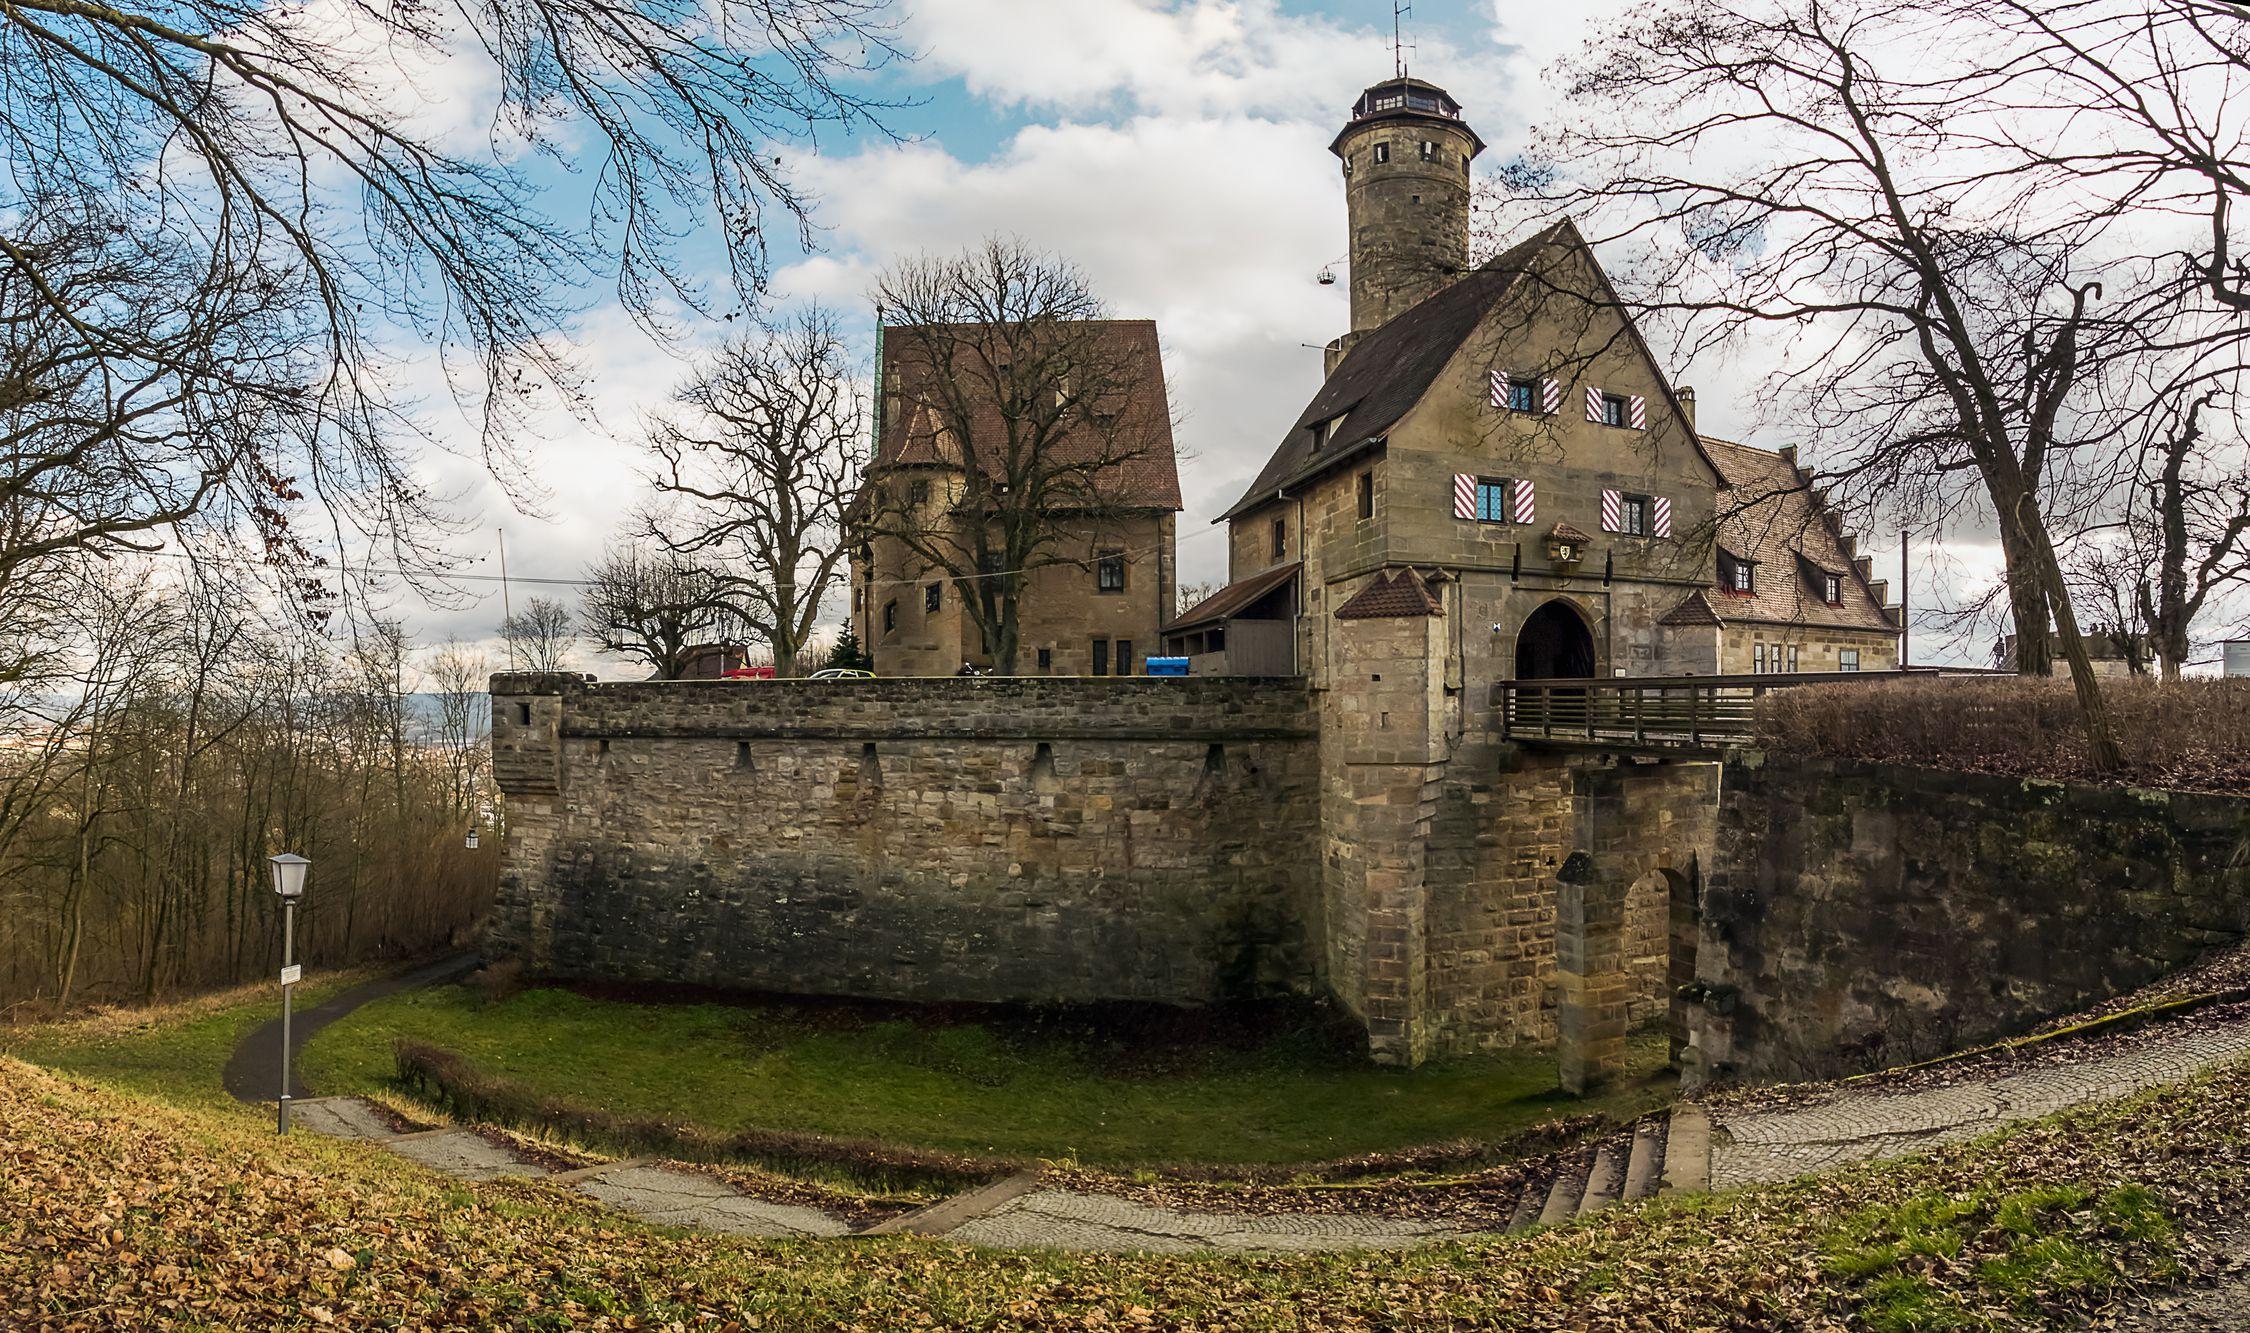 Bamberg's Altenburg